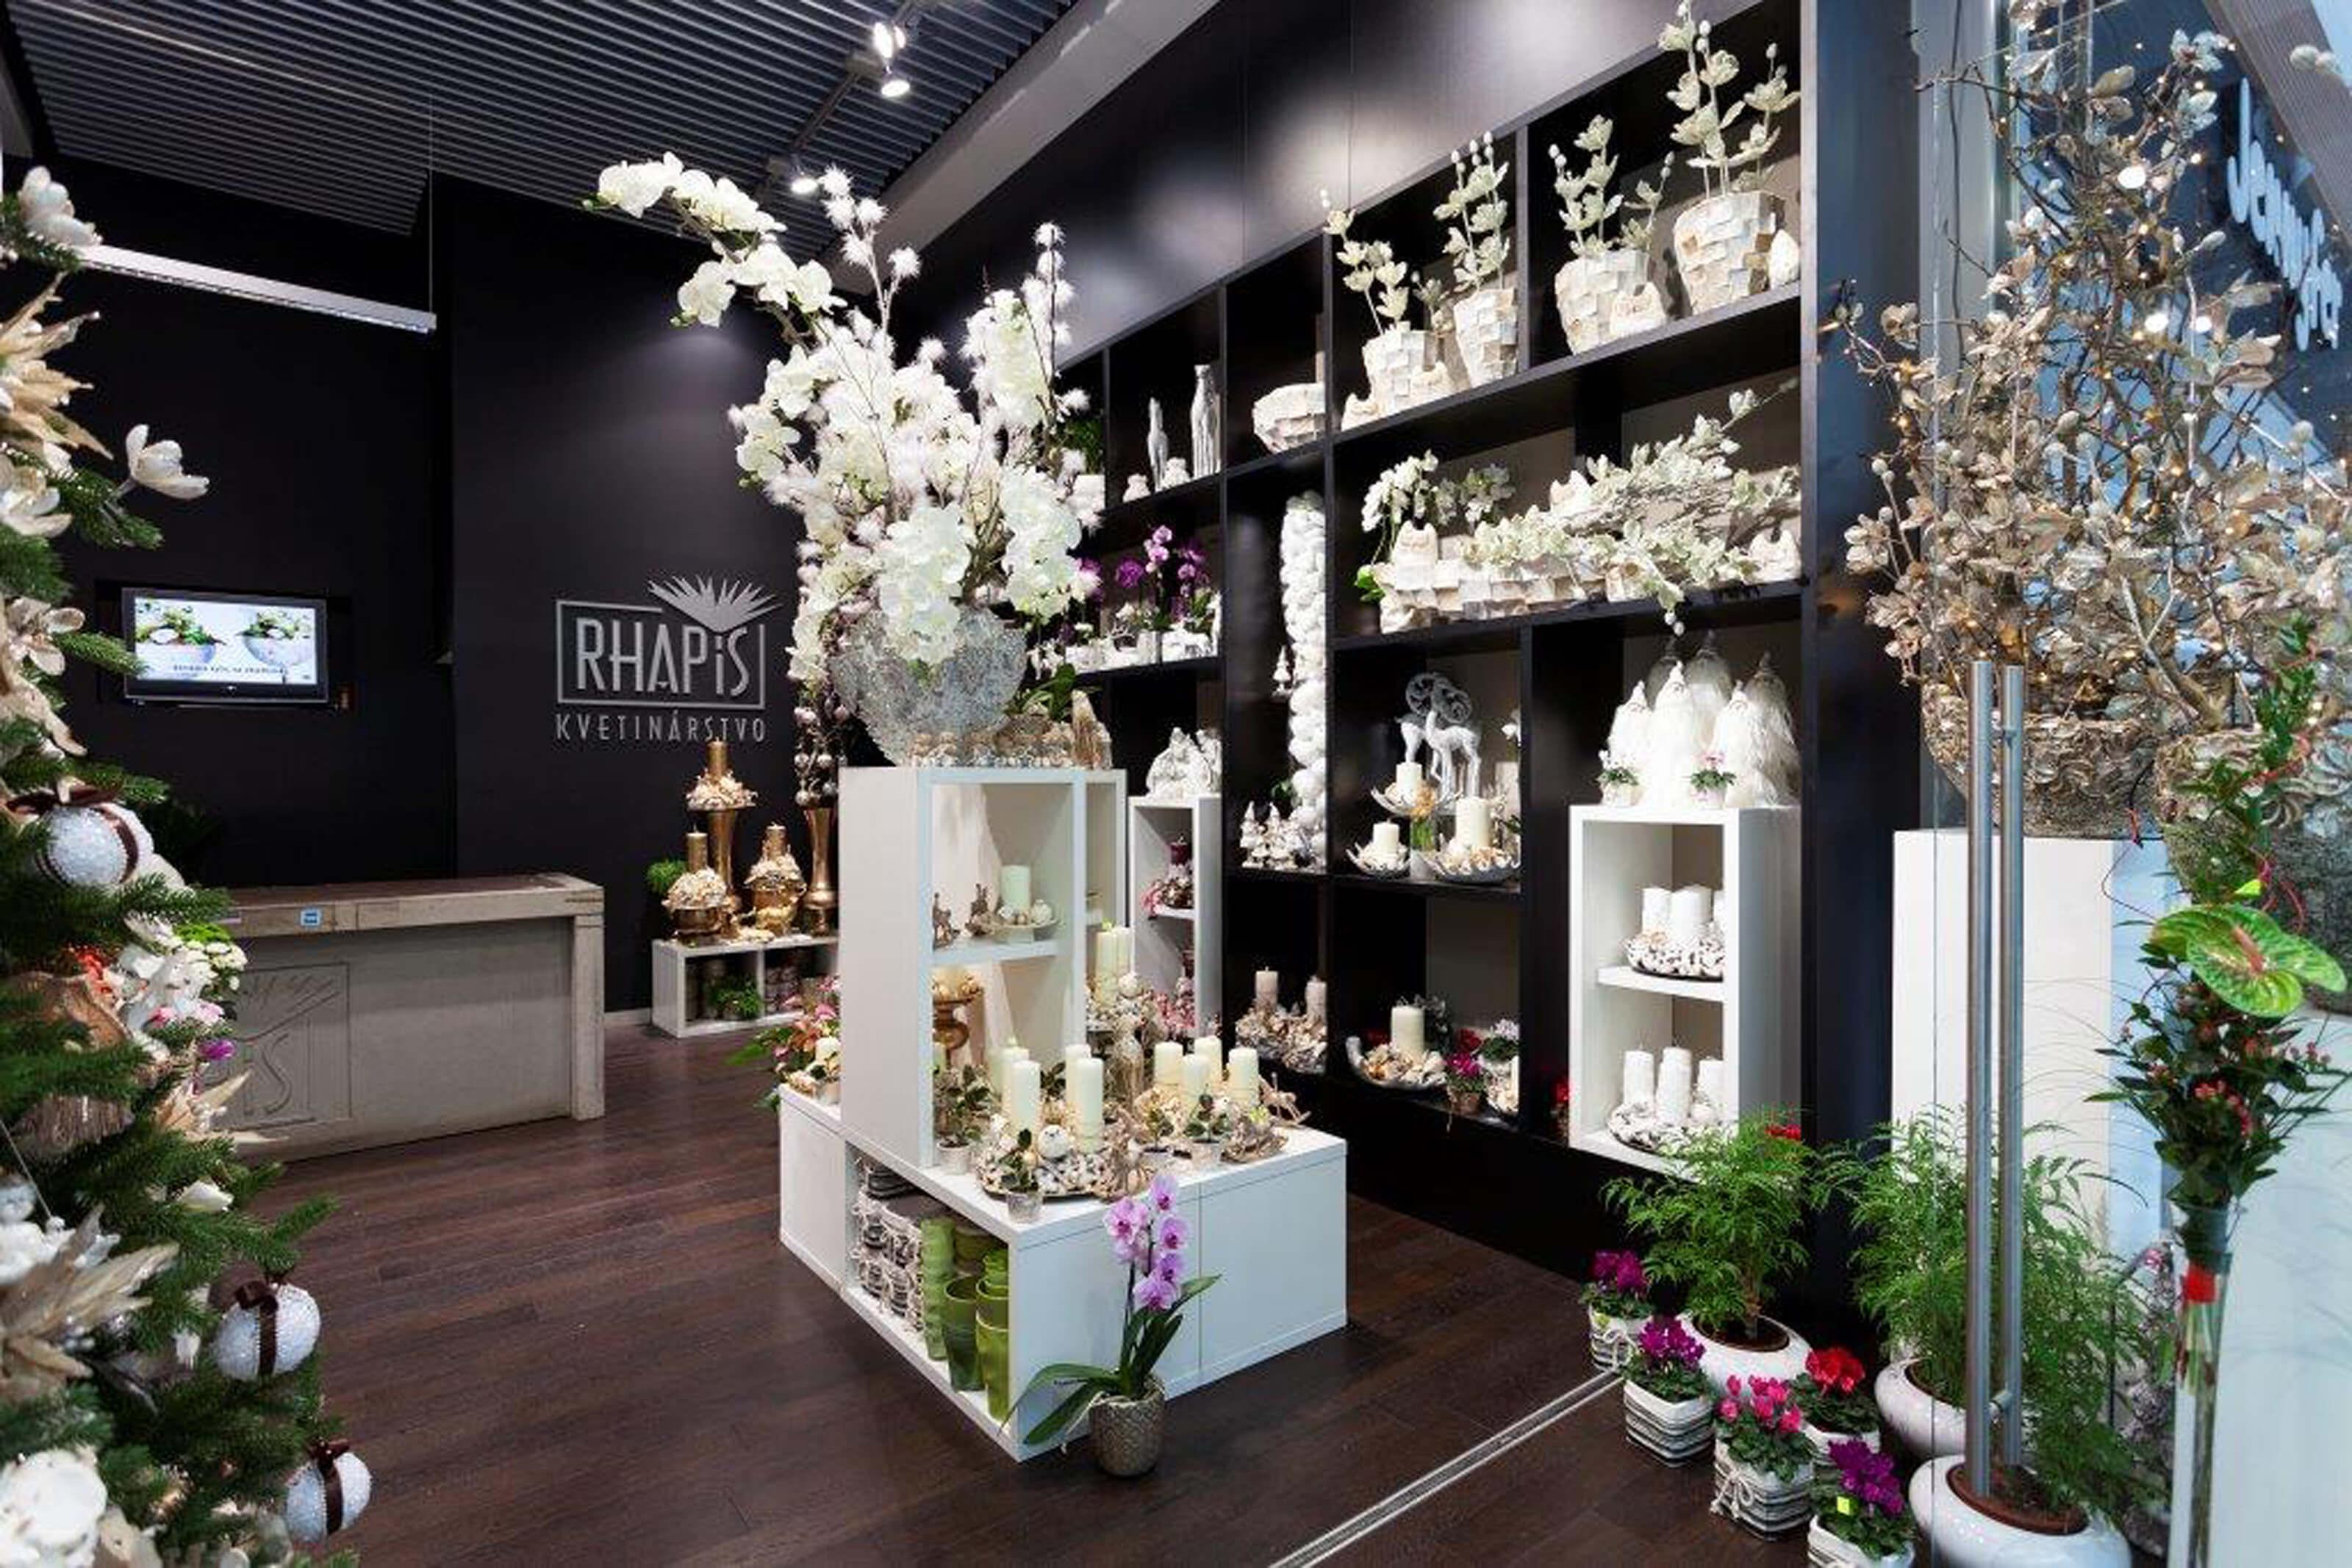 930bd89b42 Luxusné kvetinárstvo Rhapis